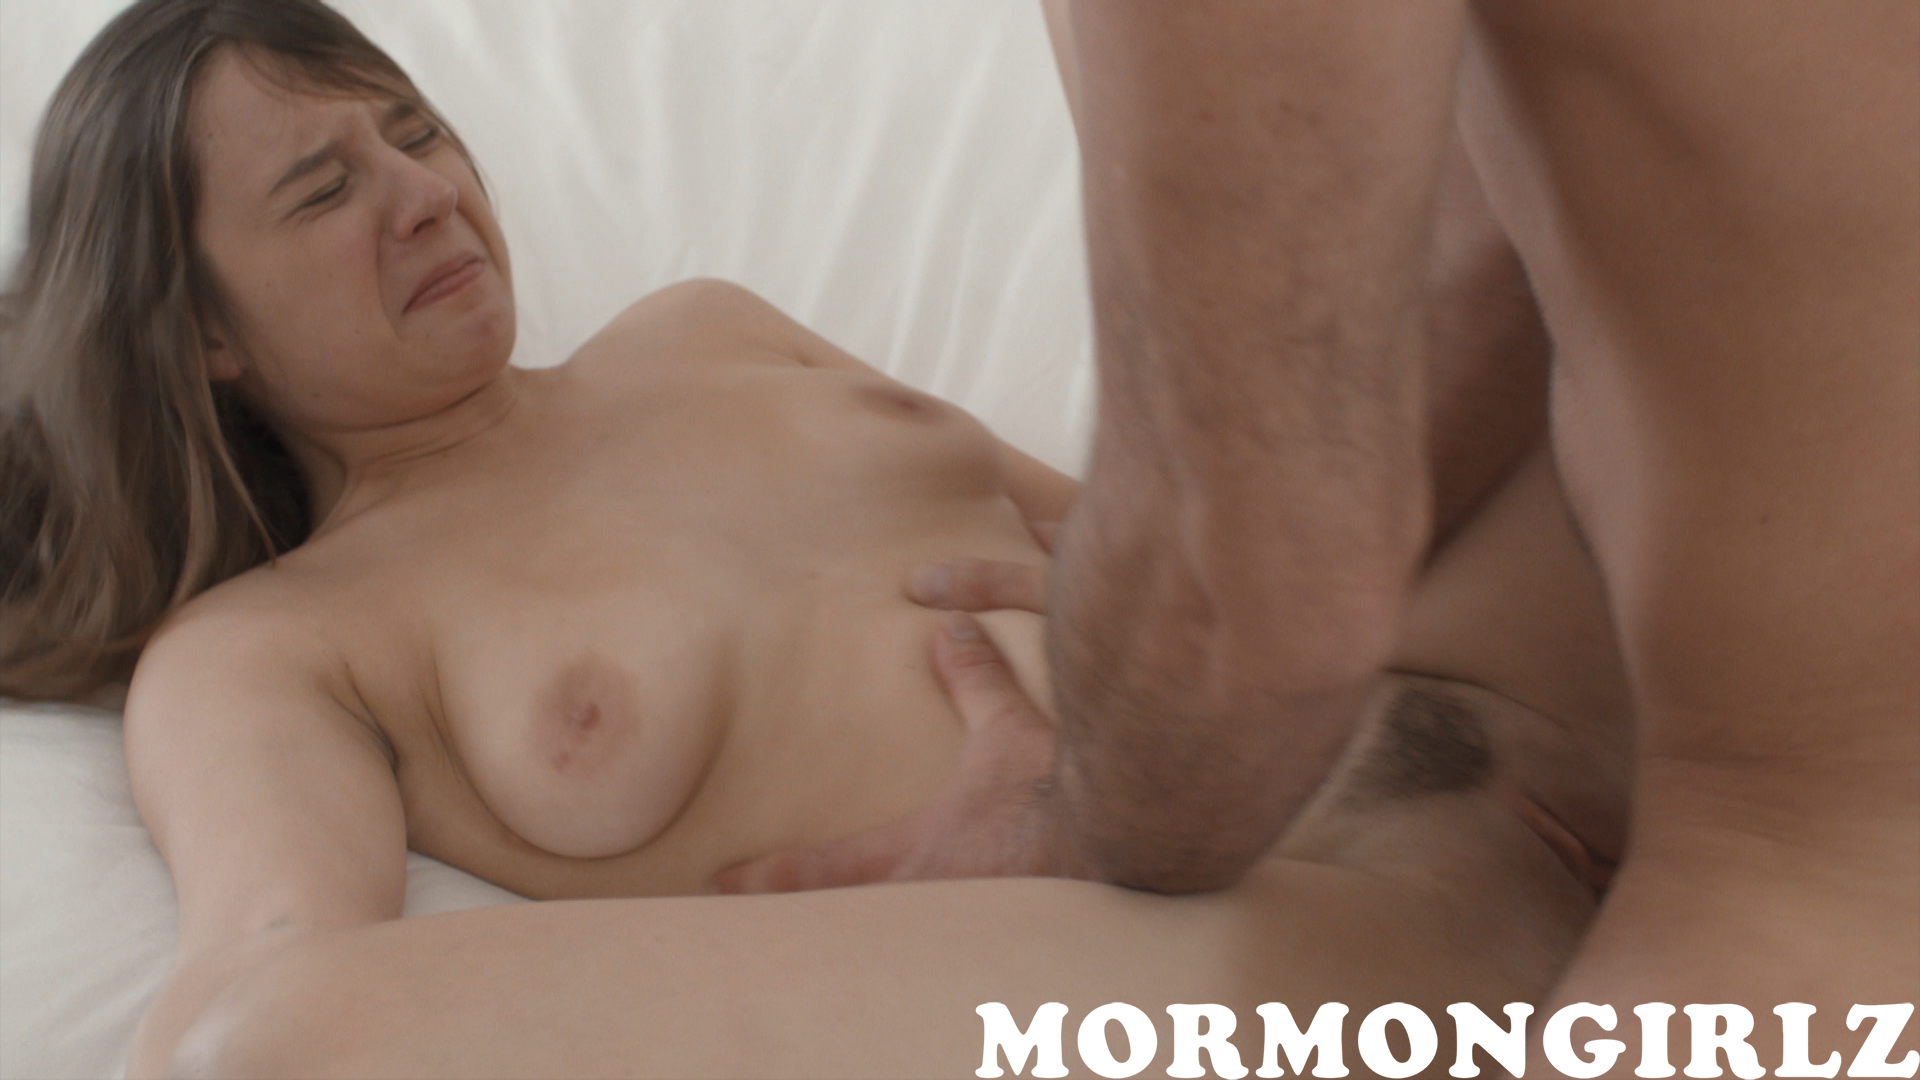 076_mormongirlz_0040